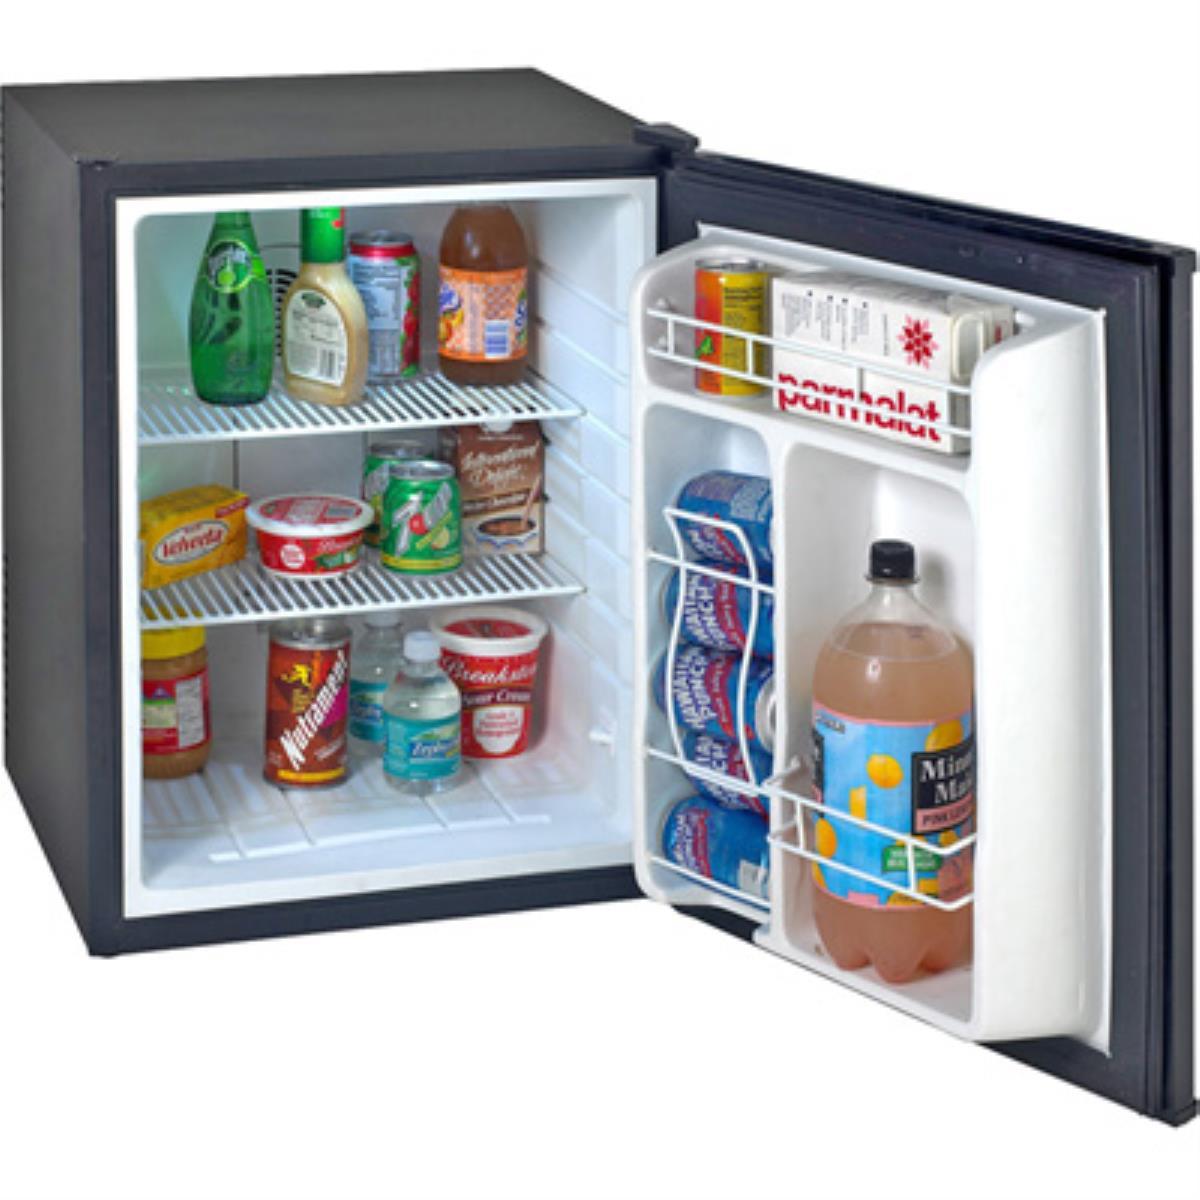 Avanti Refrigerator | Avanti Appliance Parts | 7.4 Cubic Foot Refrigerator